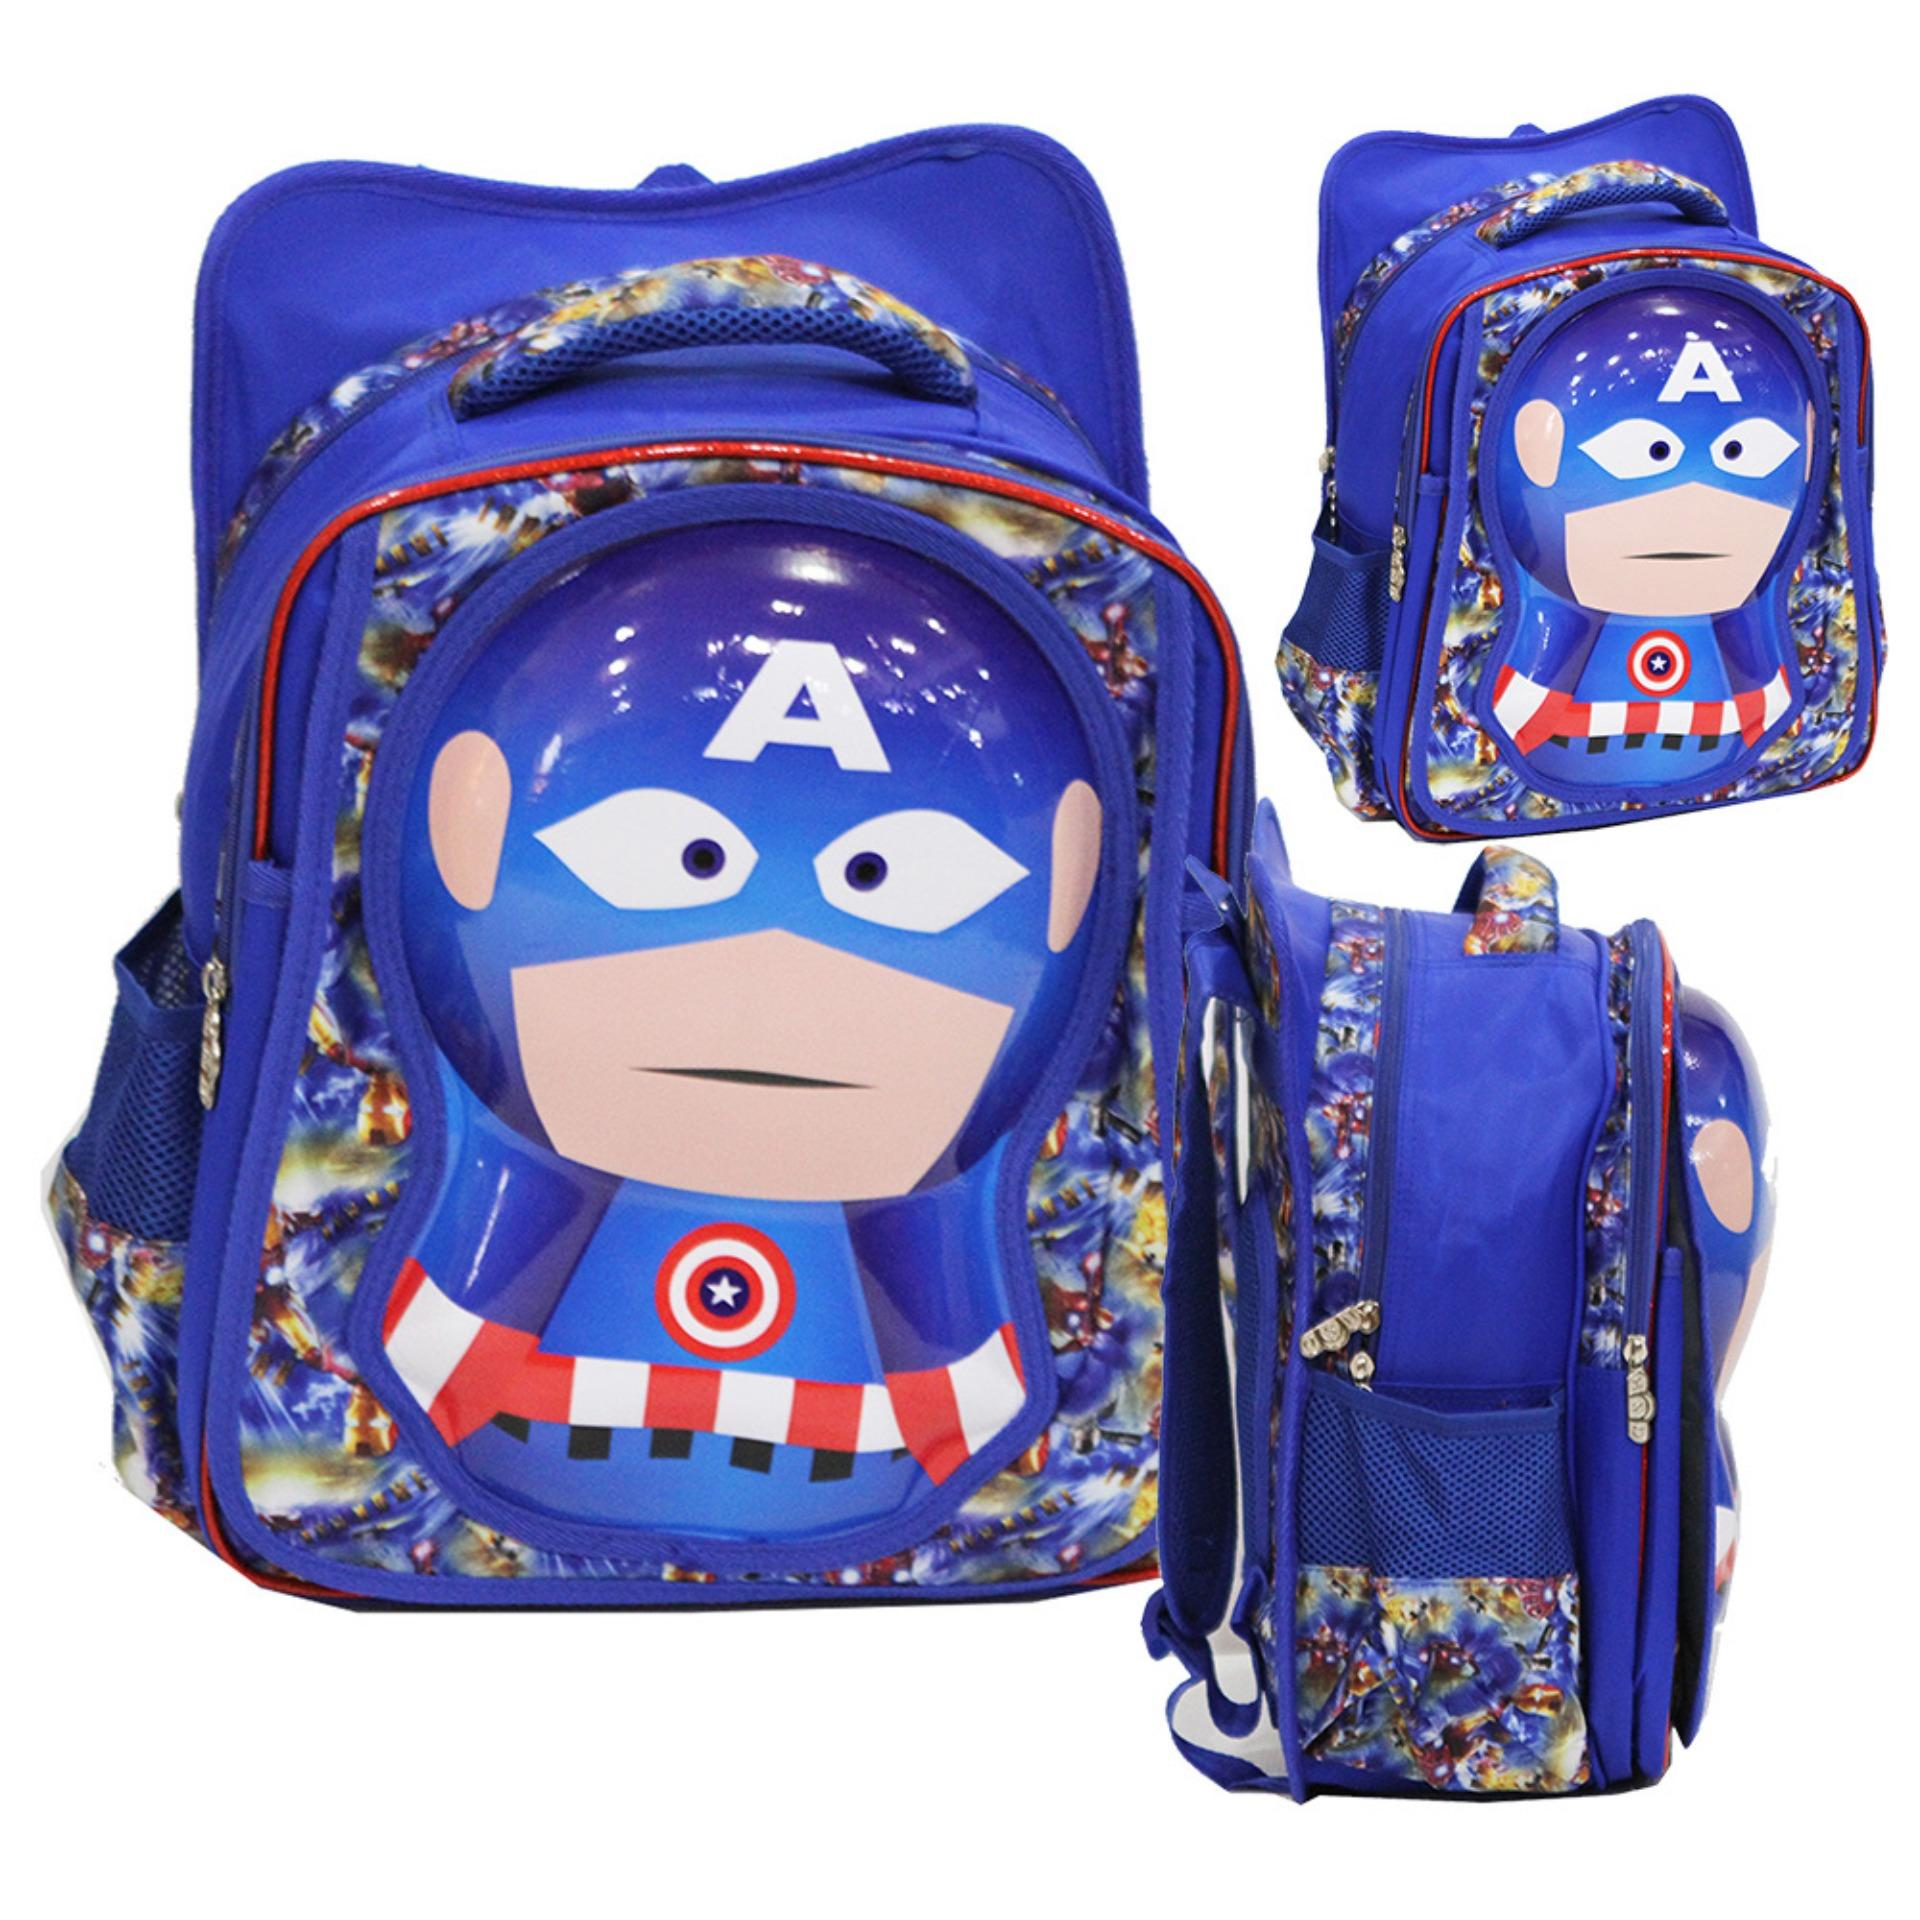 Jual Onlan Tas Ransel Anak Sekolah Sd Motif Karakter Captain America 6D Timbul Import Blue Murah